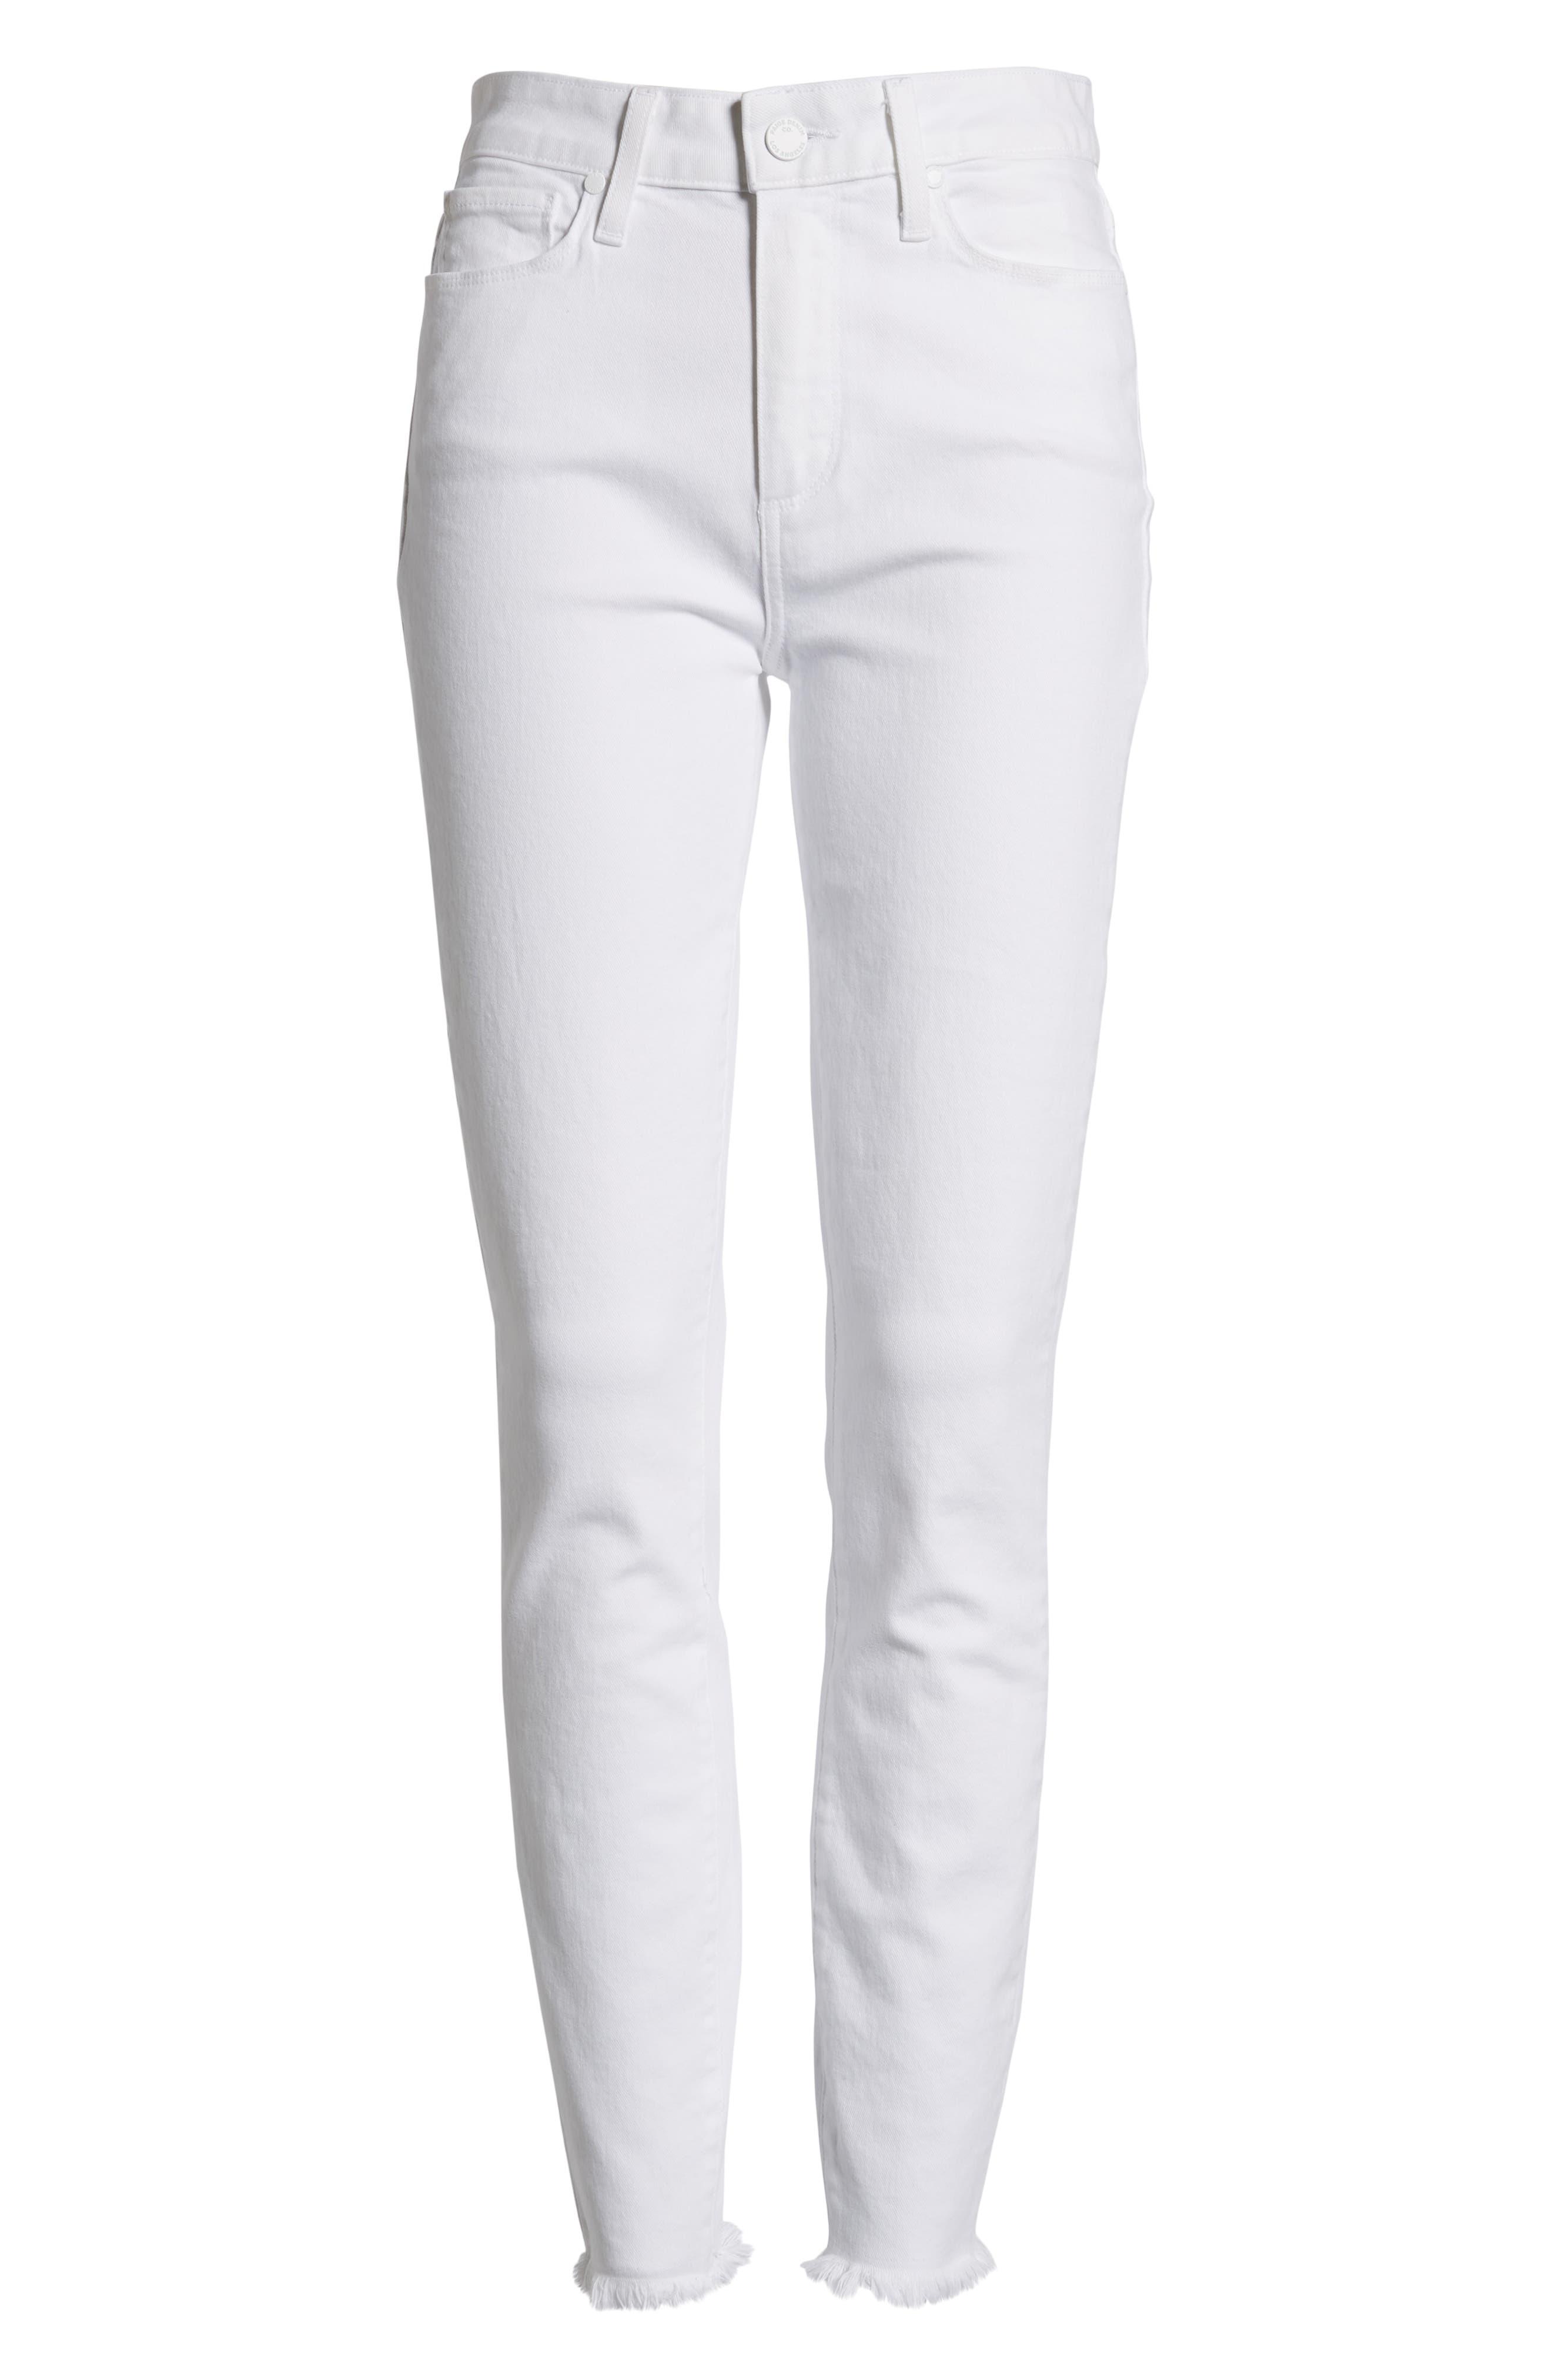 PAIGE, Hoxton High Waist Ankle Skinny Jeans, Alternate thumbnail 7, color, CRISP WHITE